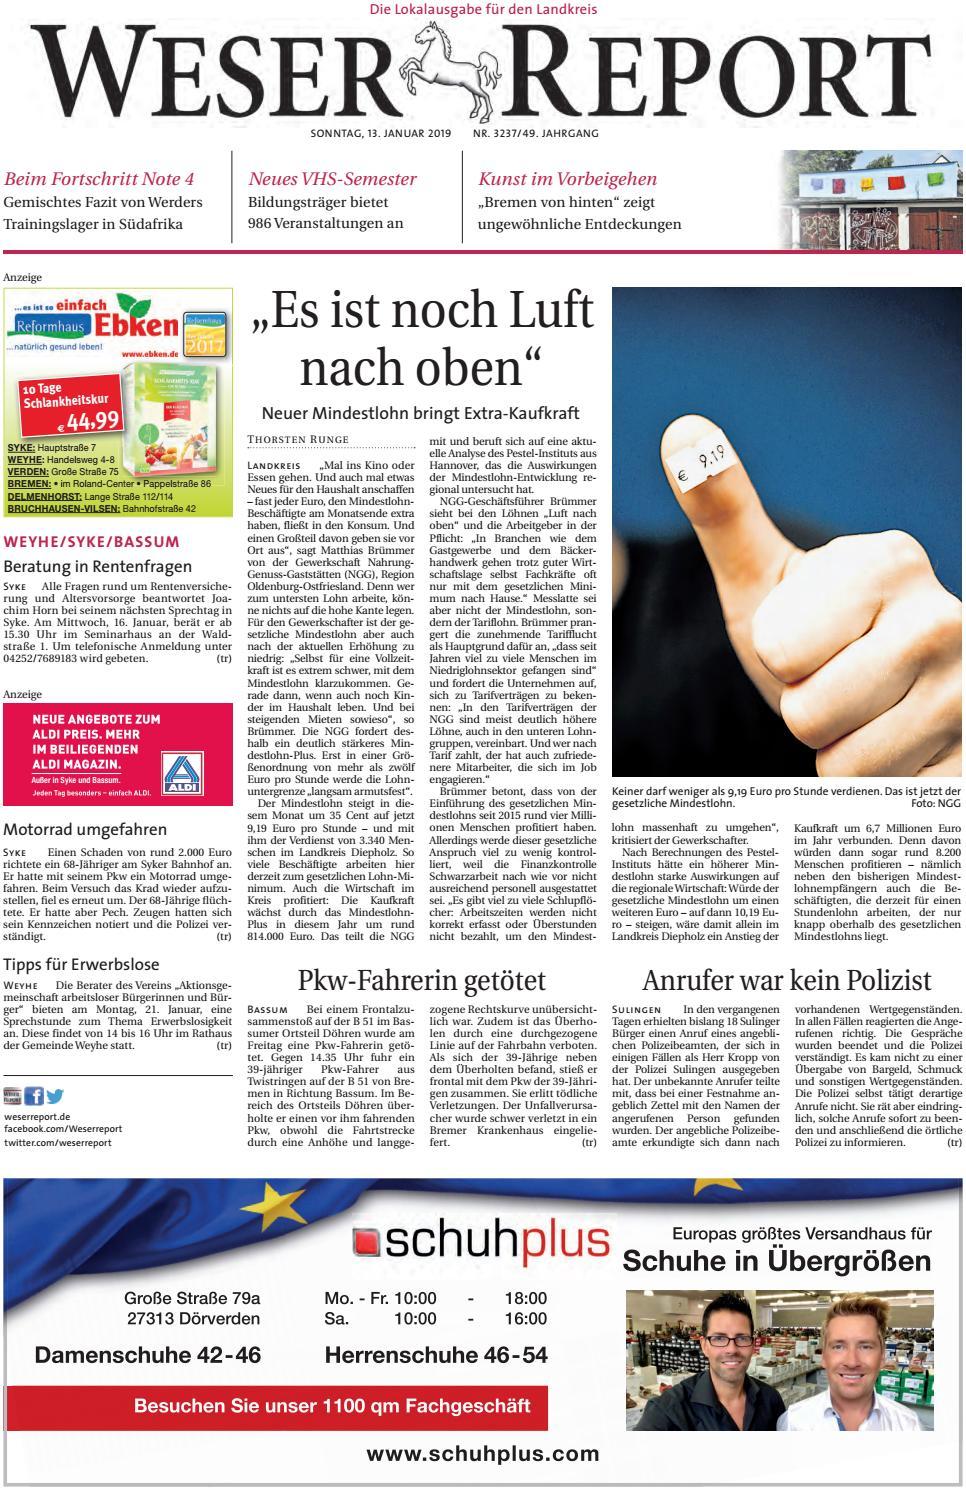 Weser Report - Weyhe, Syke, Bassum vom 13.01.2019 by KPS ...